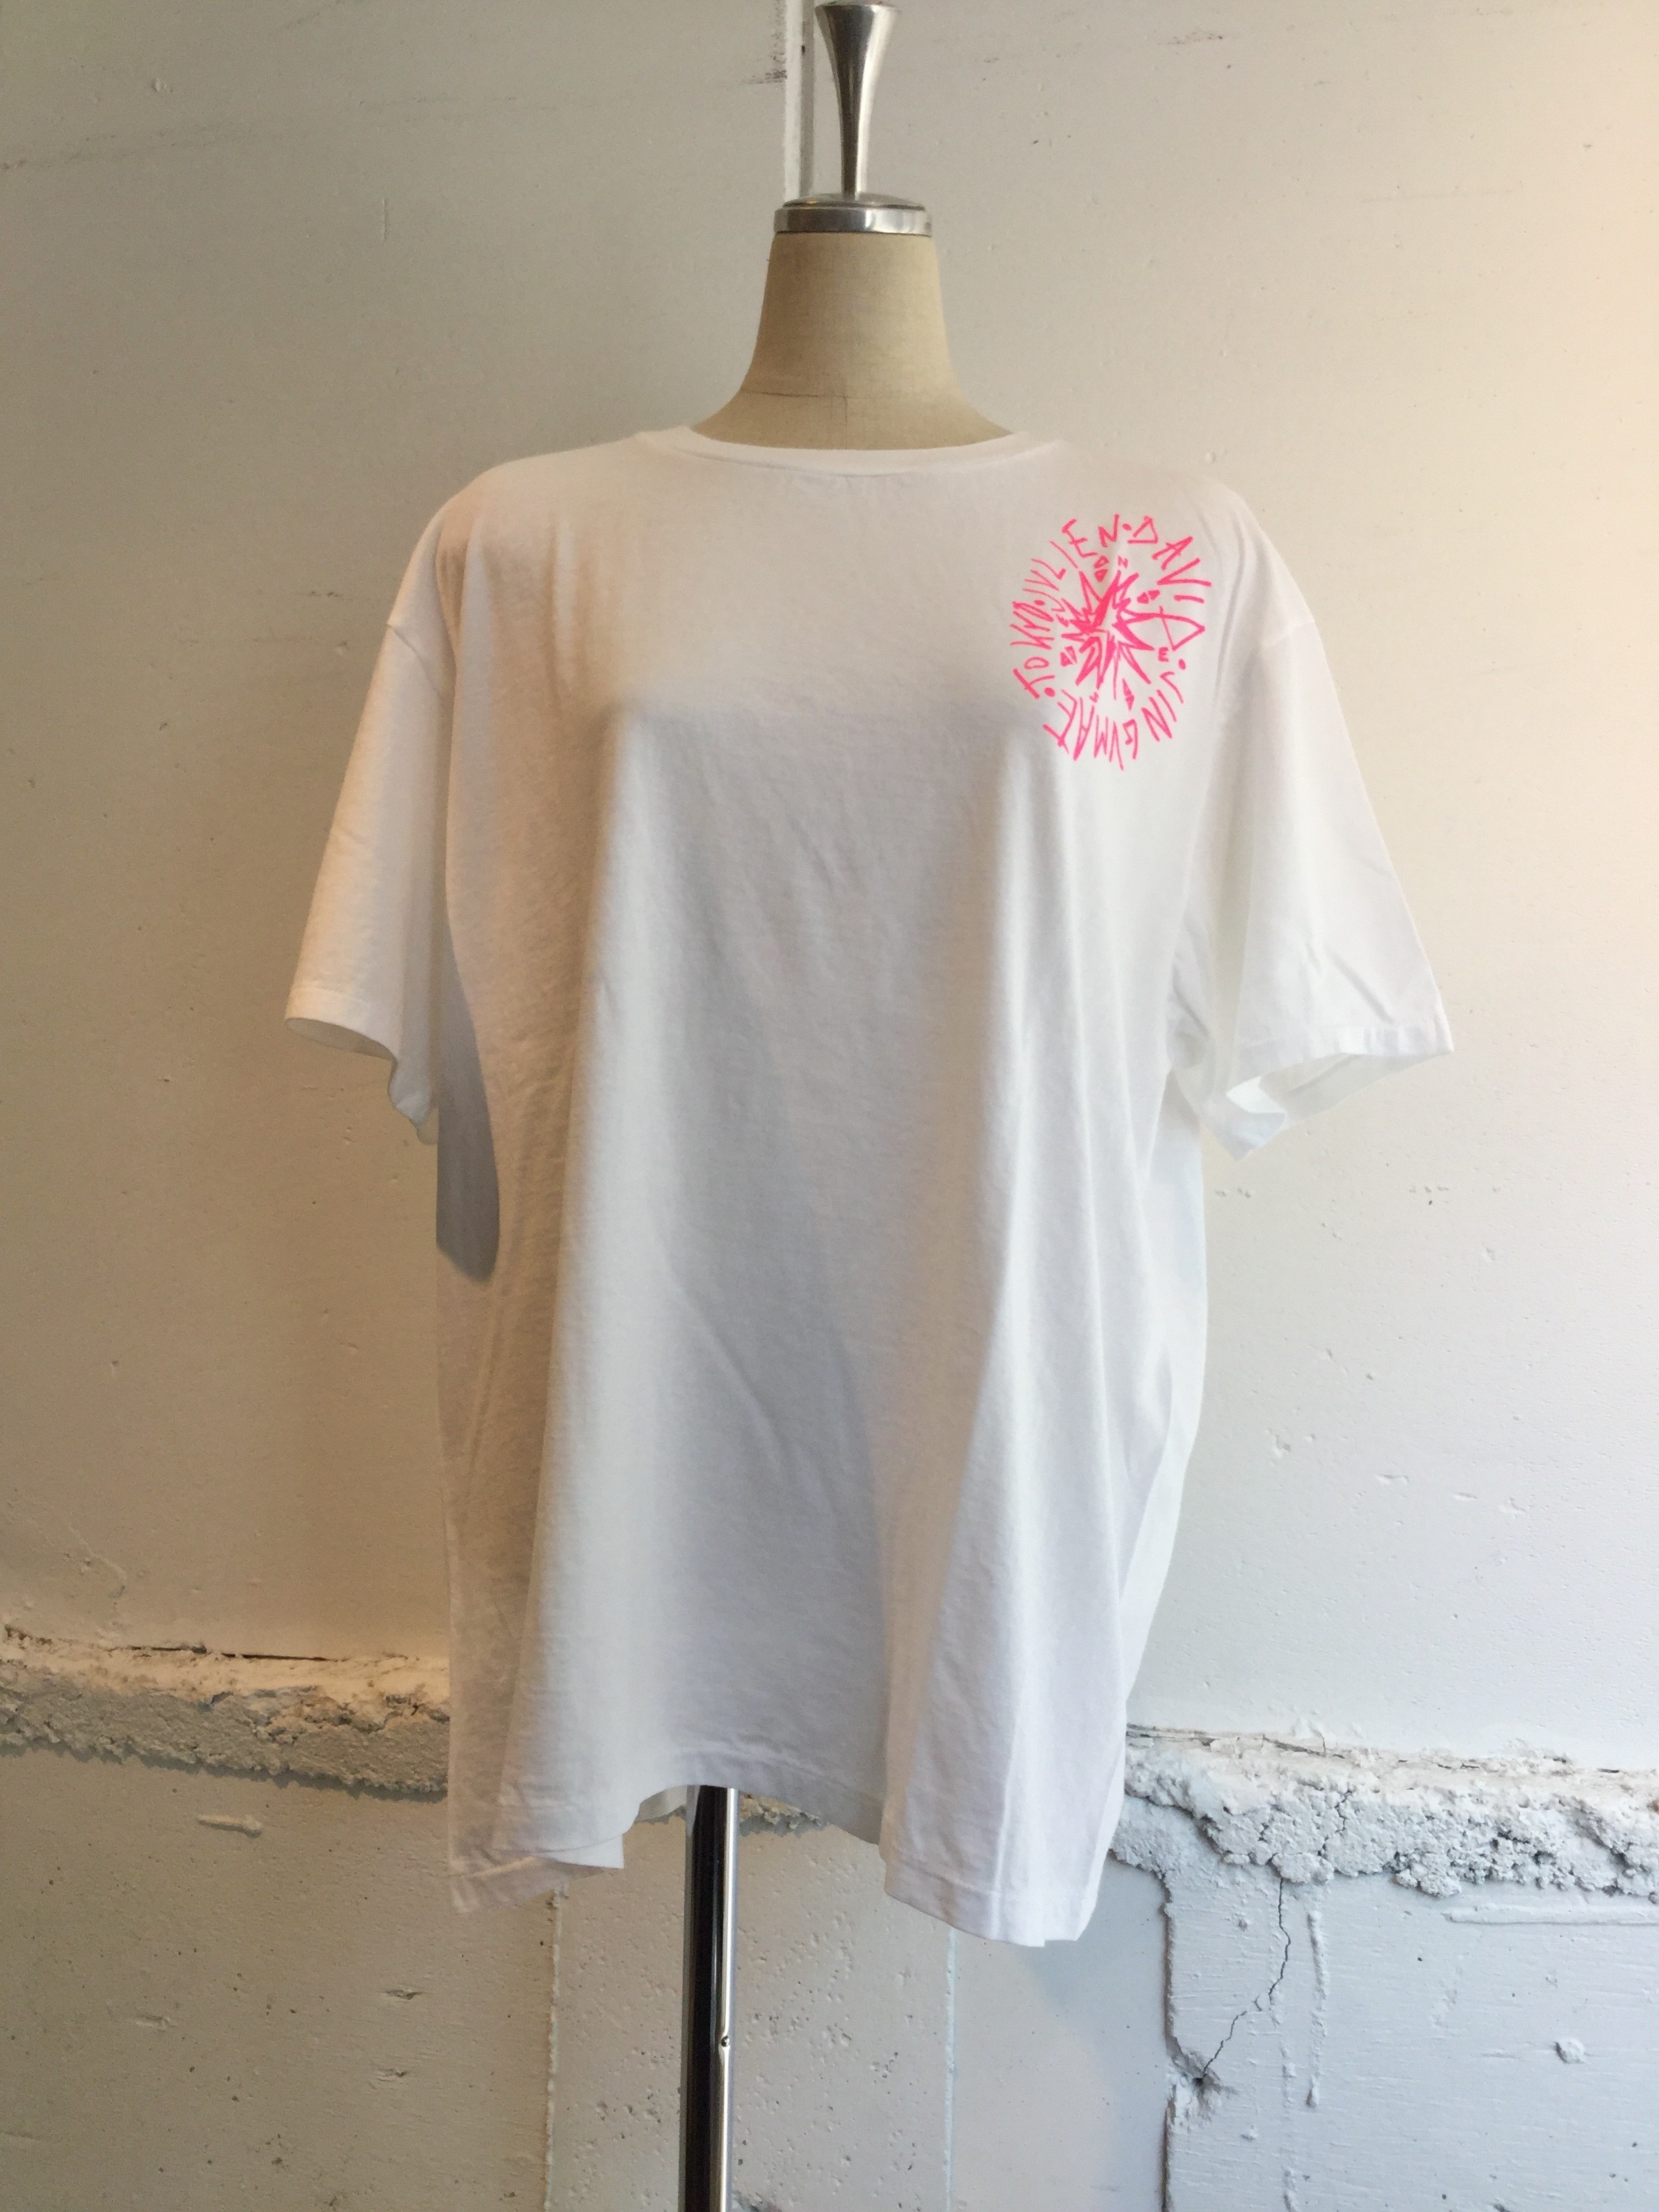 JULIEN DAVID Printed T-shirt COMPASS (WHITE)